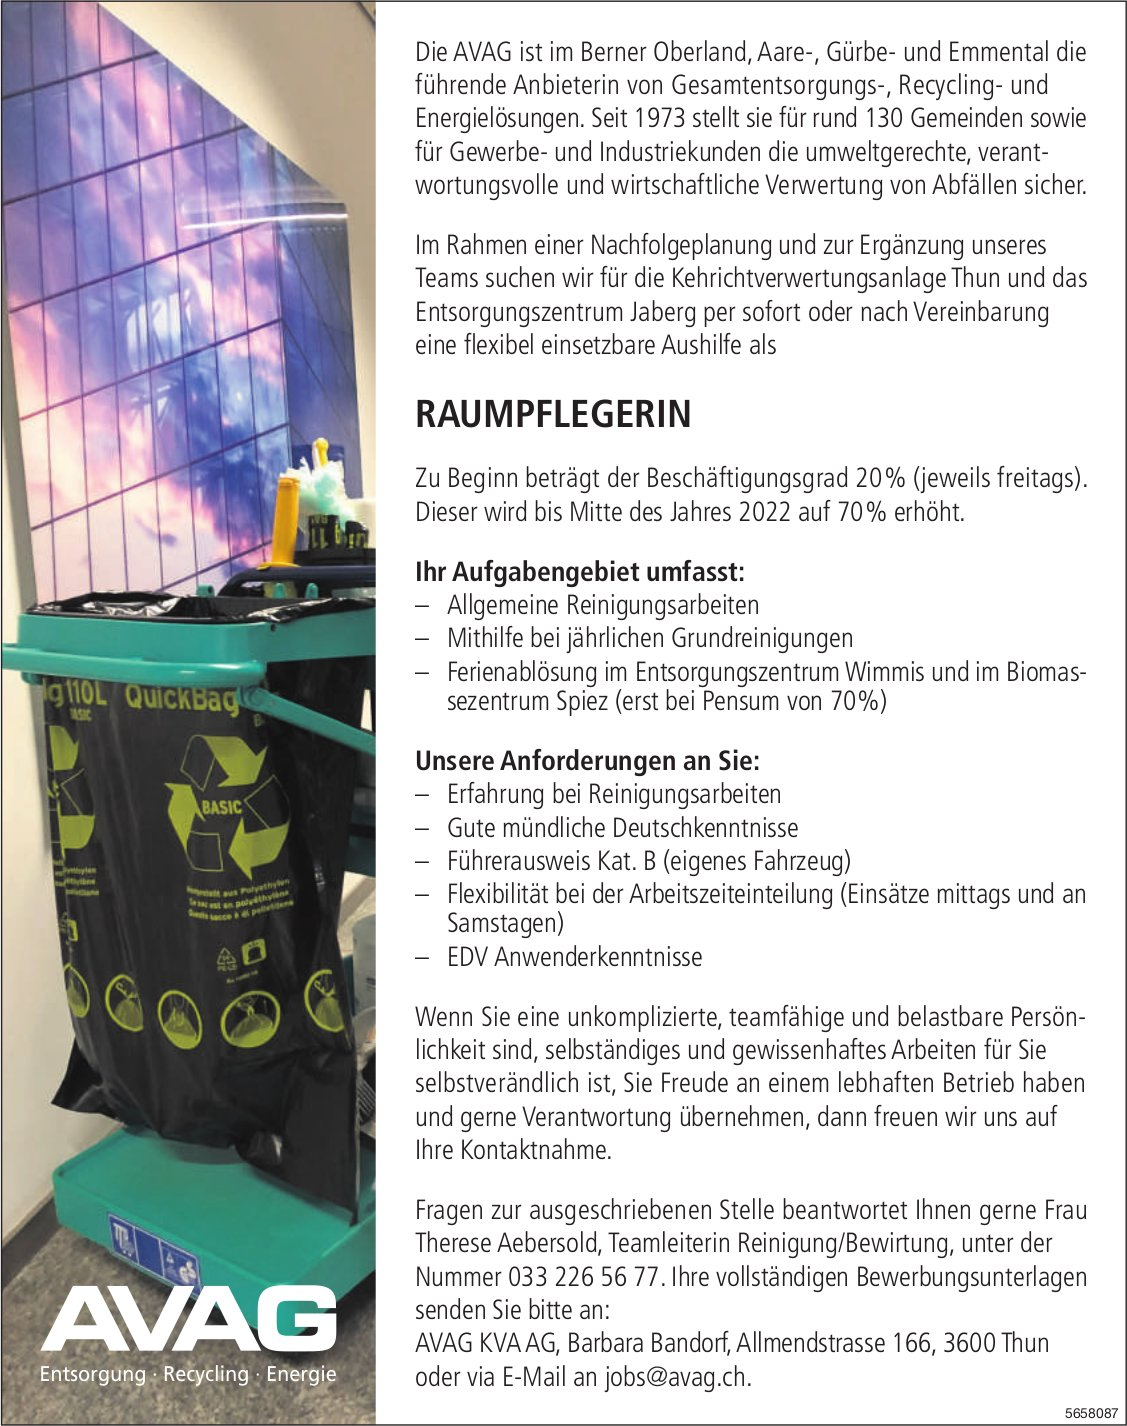 Raumpflegerin, AVAG KVA AG, Thun, gesucht